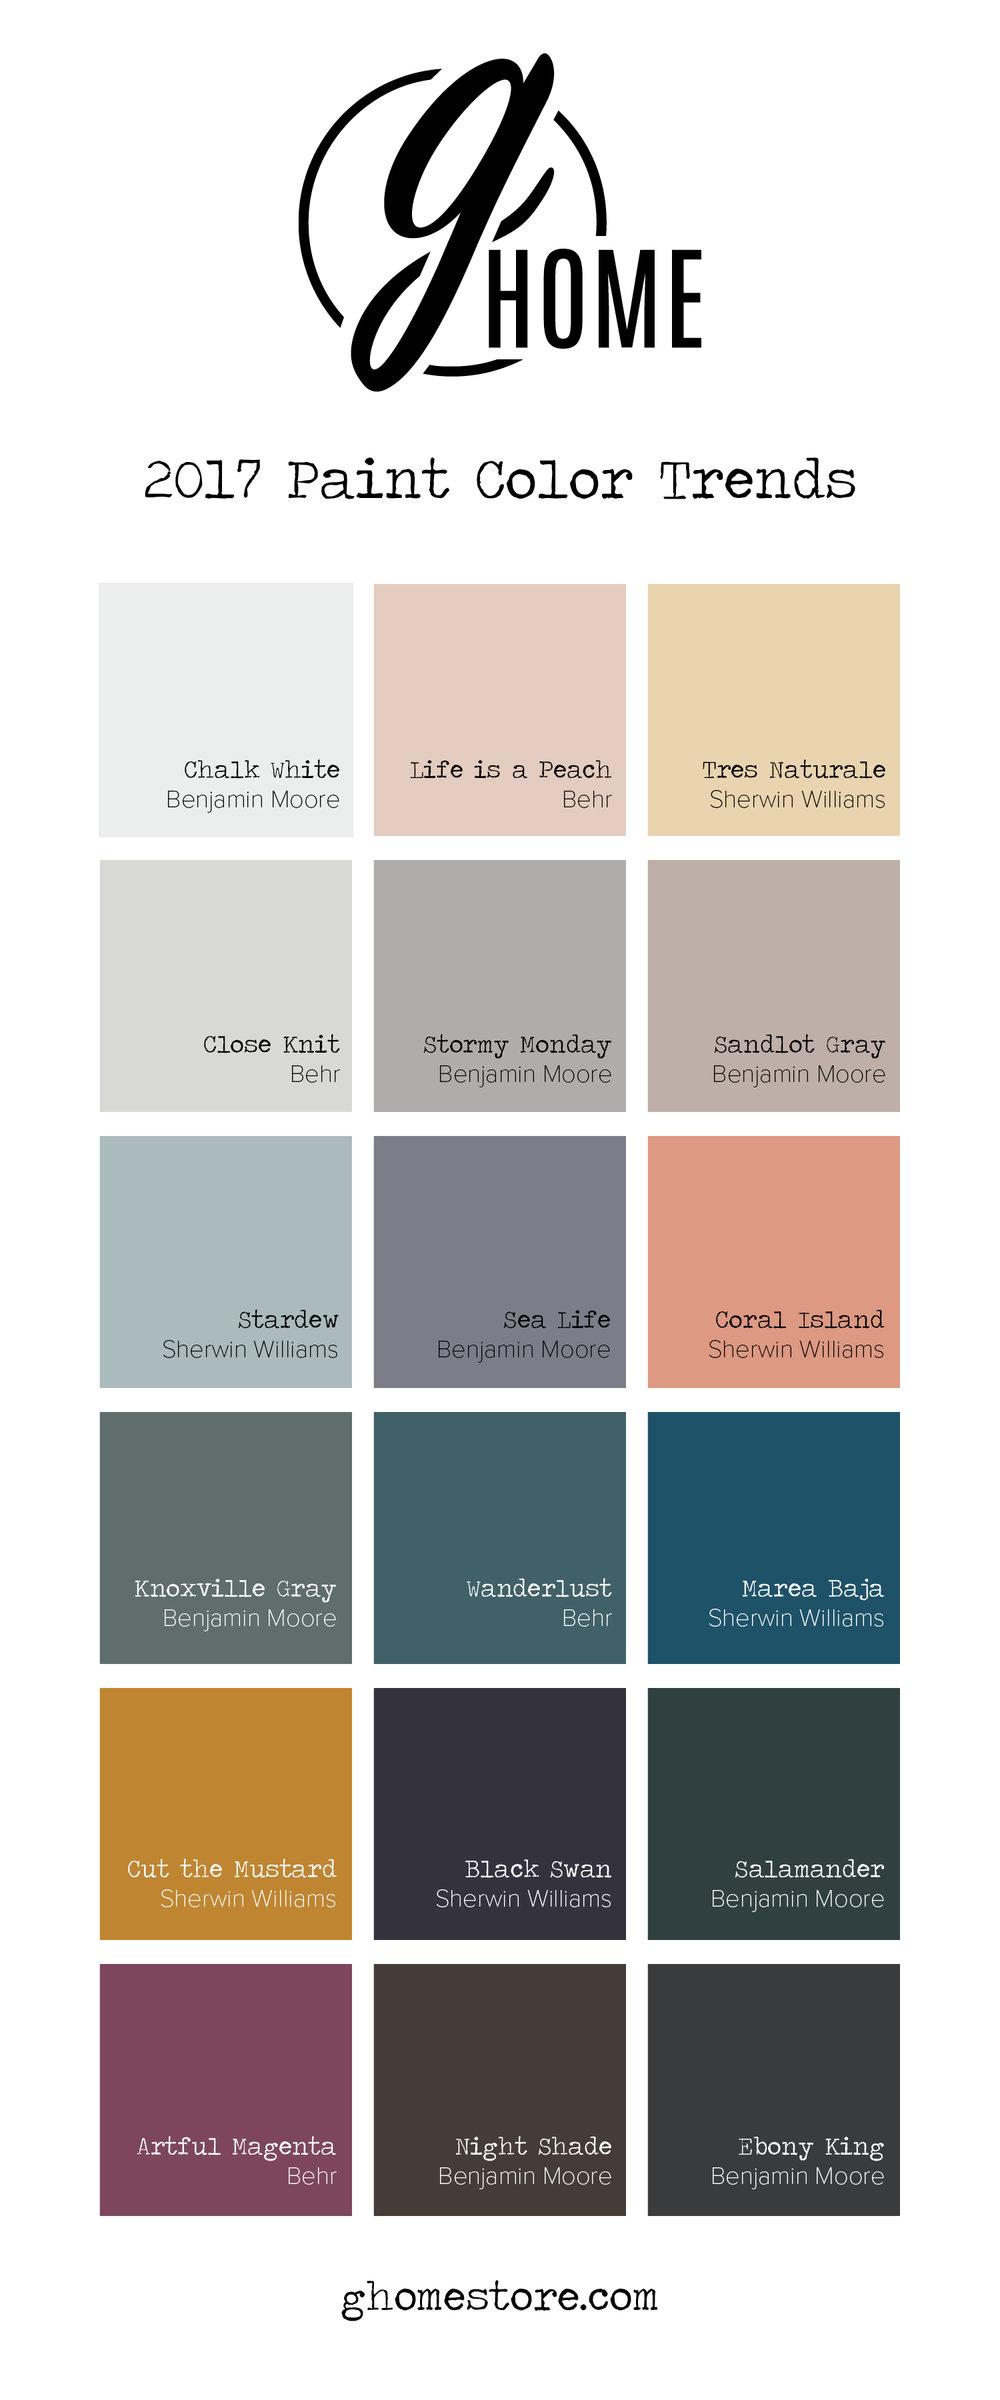 2017 paint color trends g home rh ghomestore com most popular home decor colors 2017